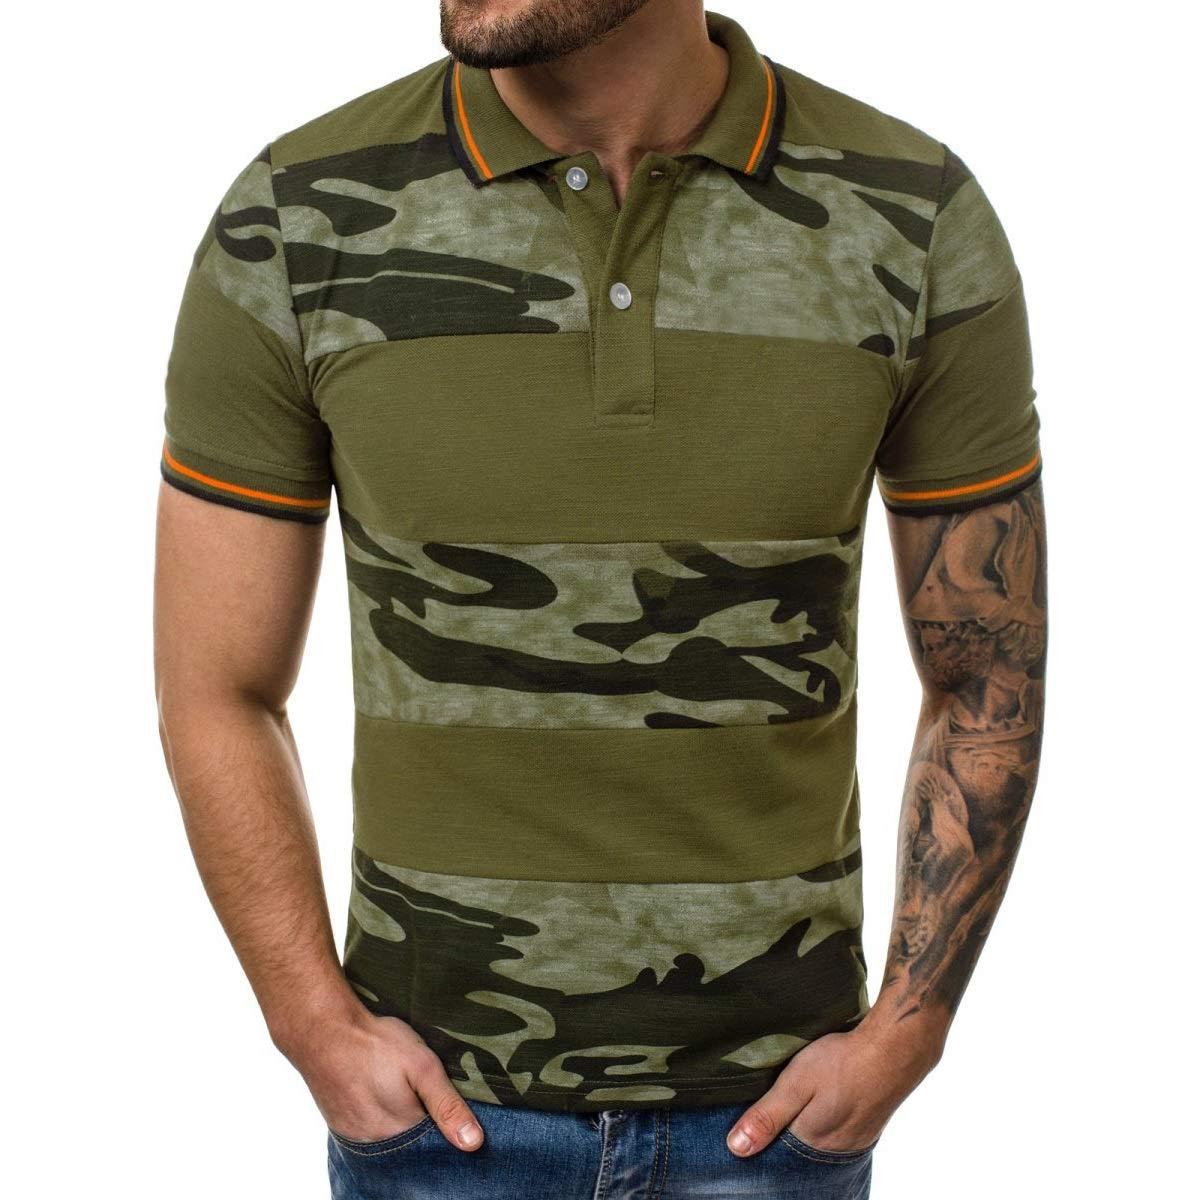 DKDUVQ Mens Stitching T-Shirt 3D Digital Printing,Camouflage European Code Short-Sleeved Mens Polo Shirt